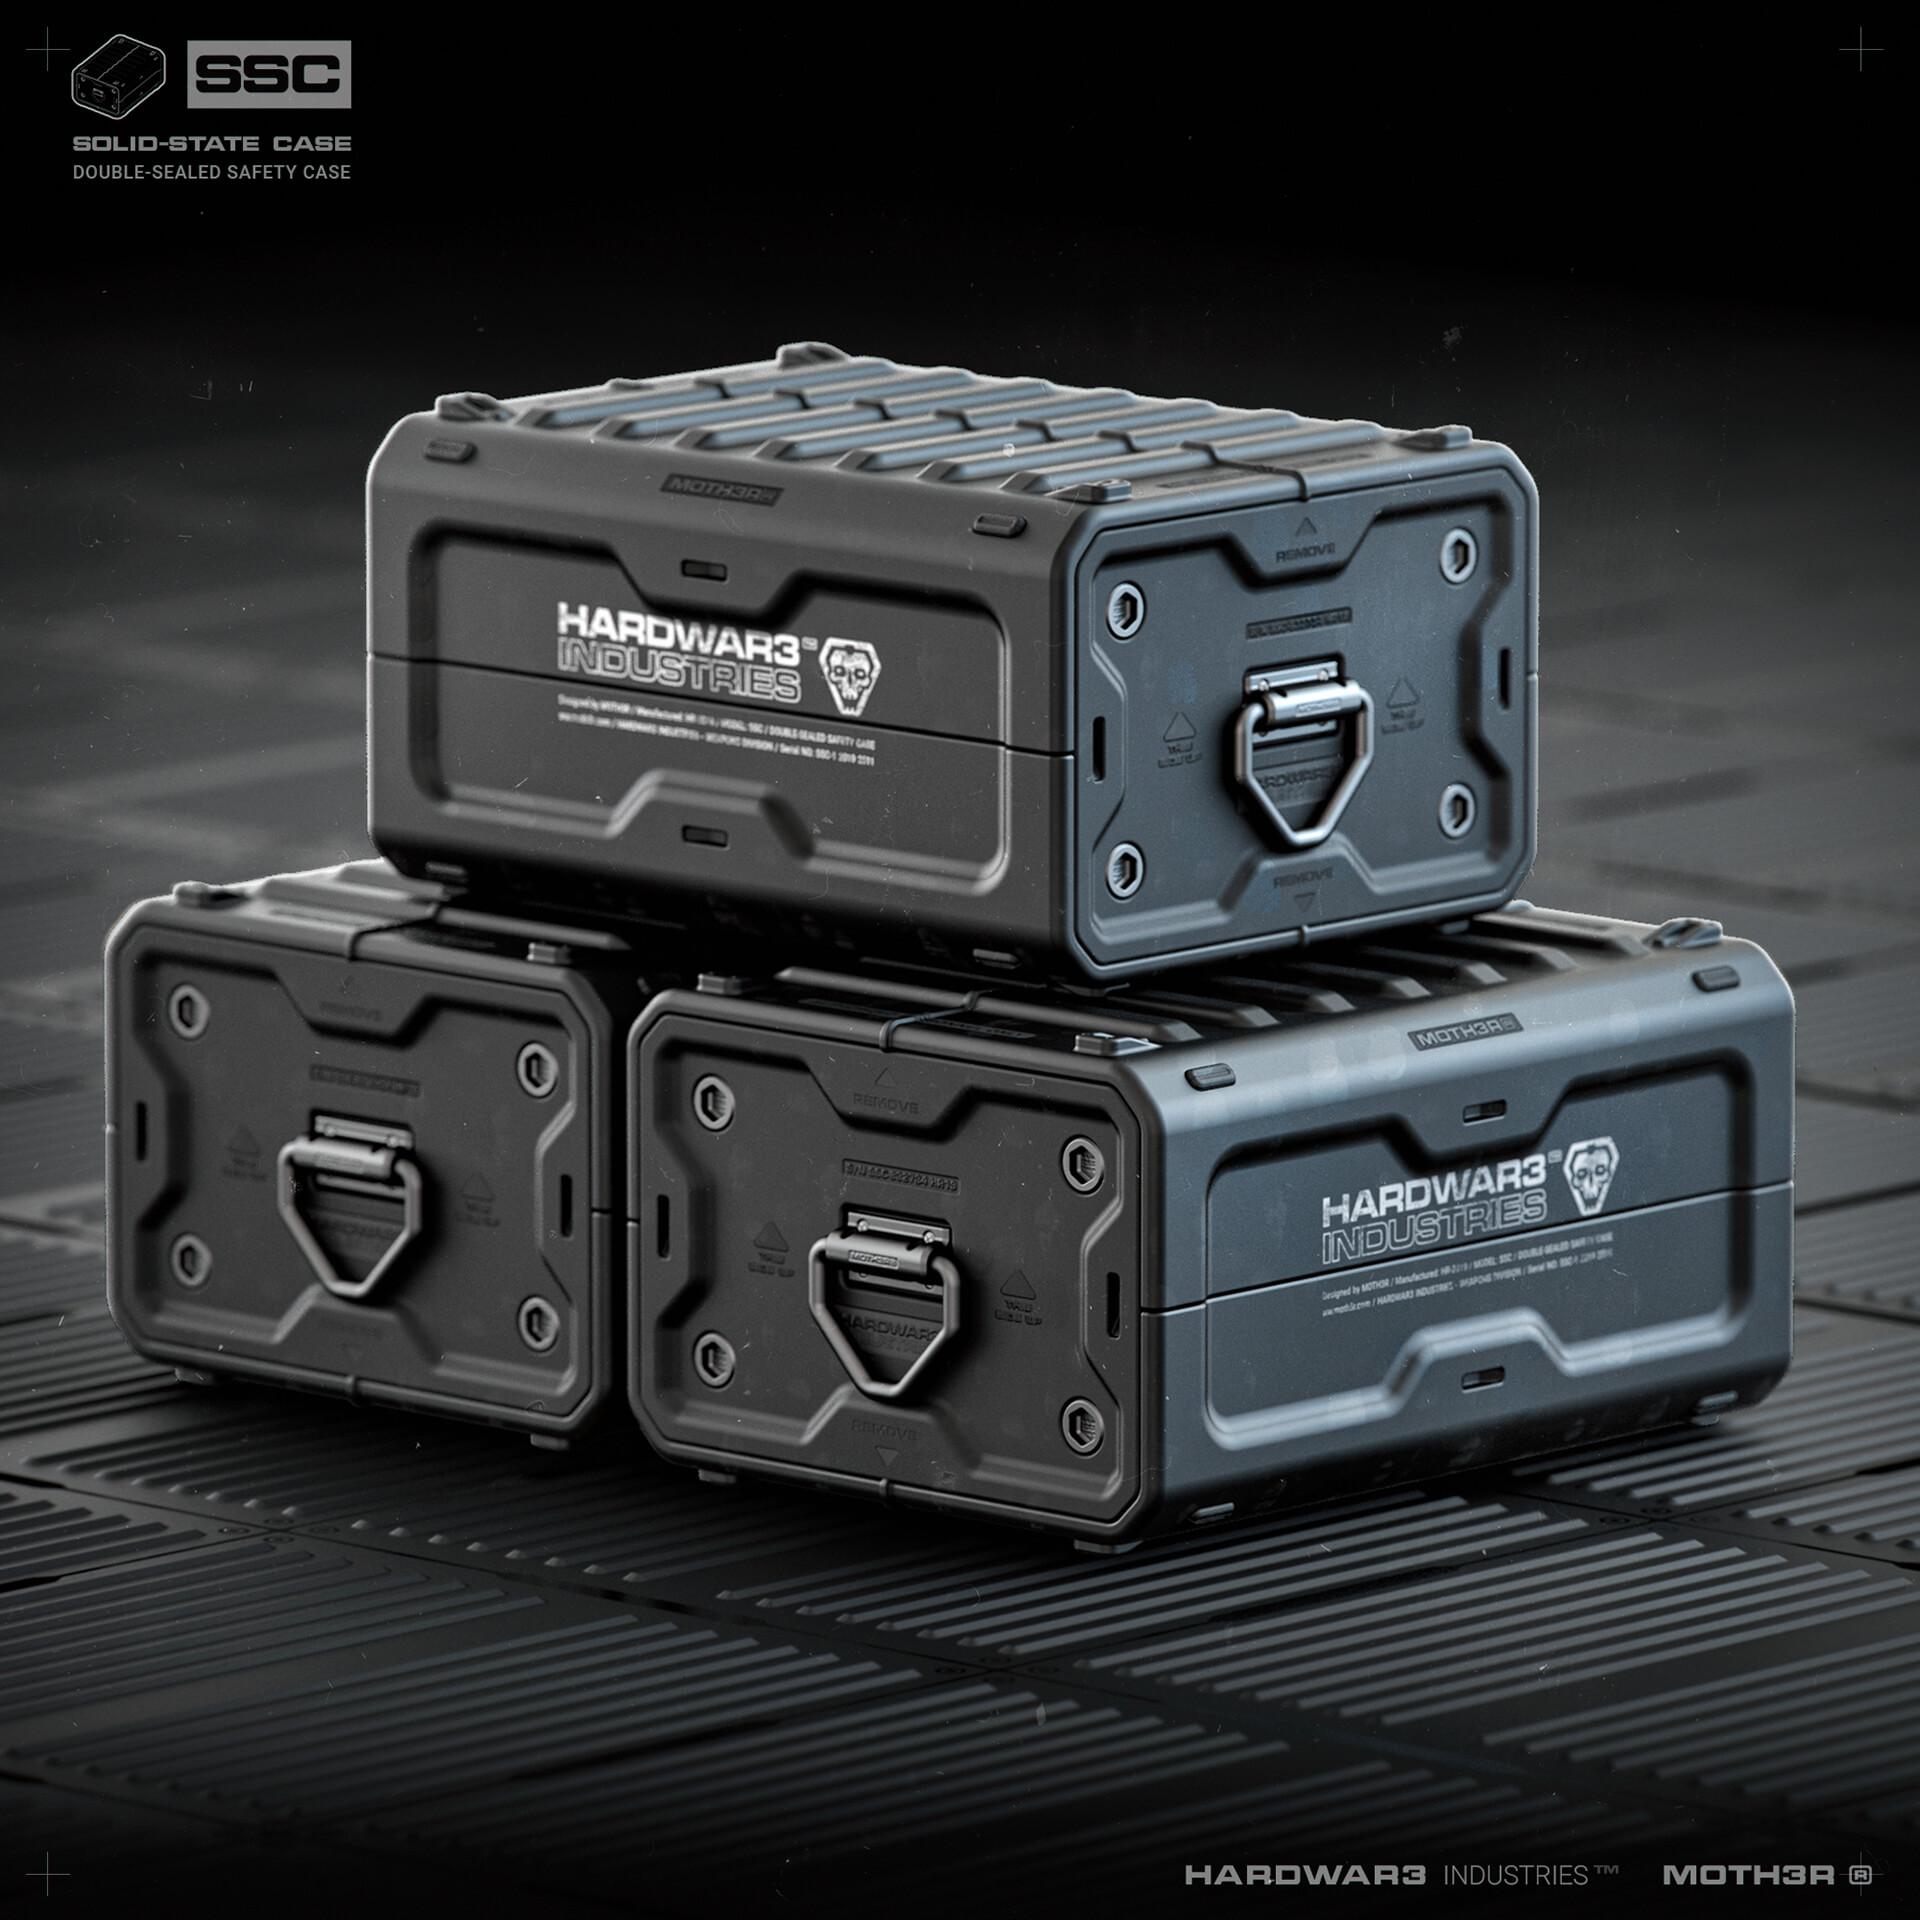 Crate-001.226